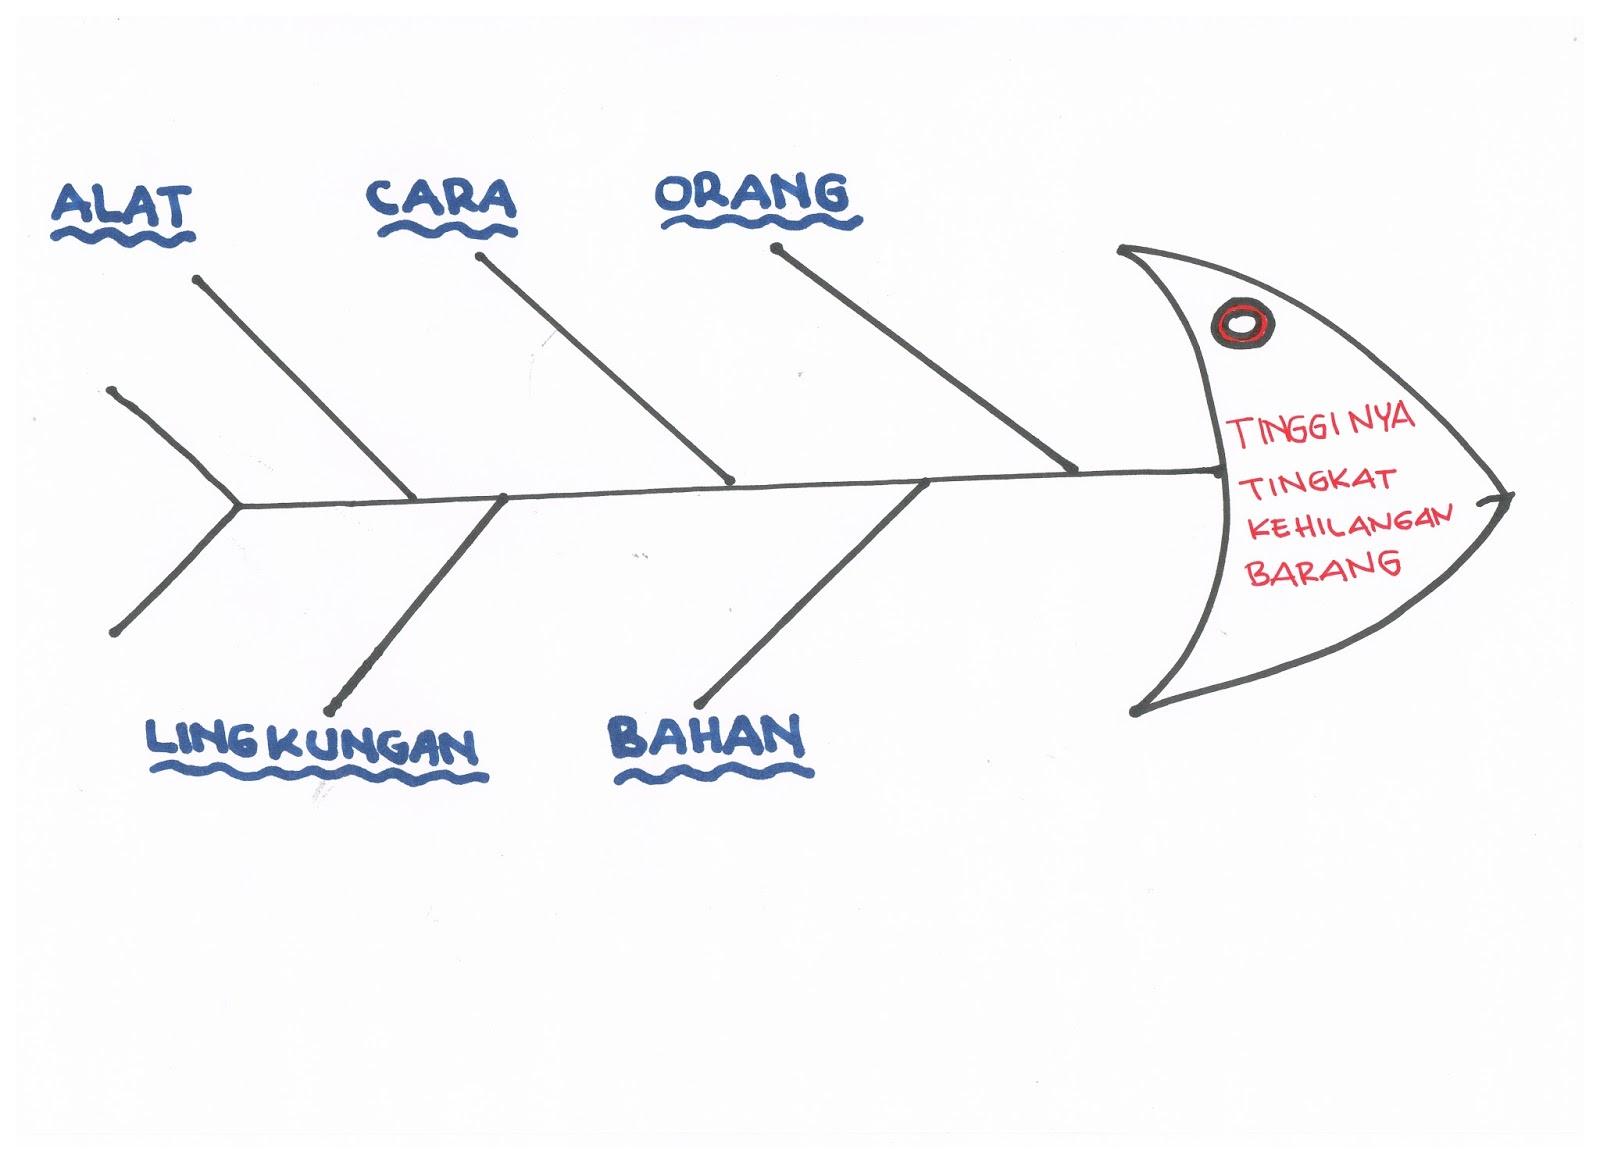 Pendidikan dan pembinaan satpam indonesia penerapan fishbone 3 cari lebih lanjut faktor faktor yang lebih terperinci dan tuliskan faktor faktor itu di kiri kanan panah penghubung ccuart Gallery